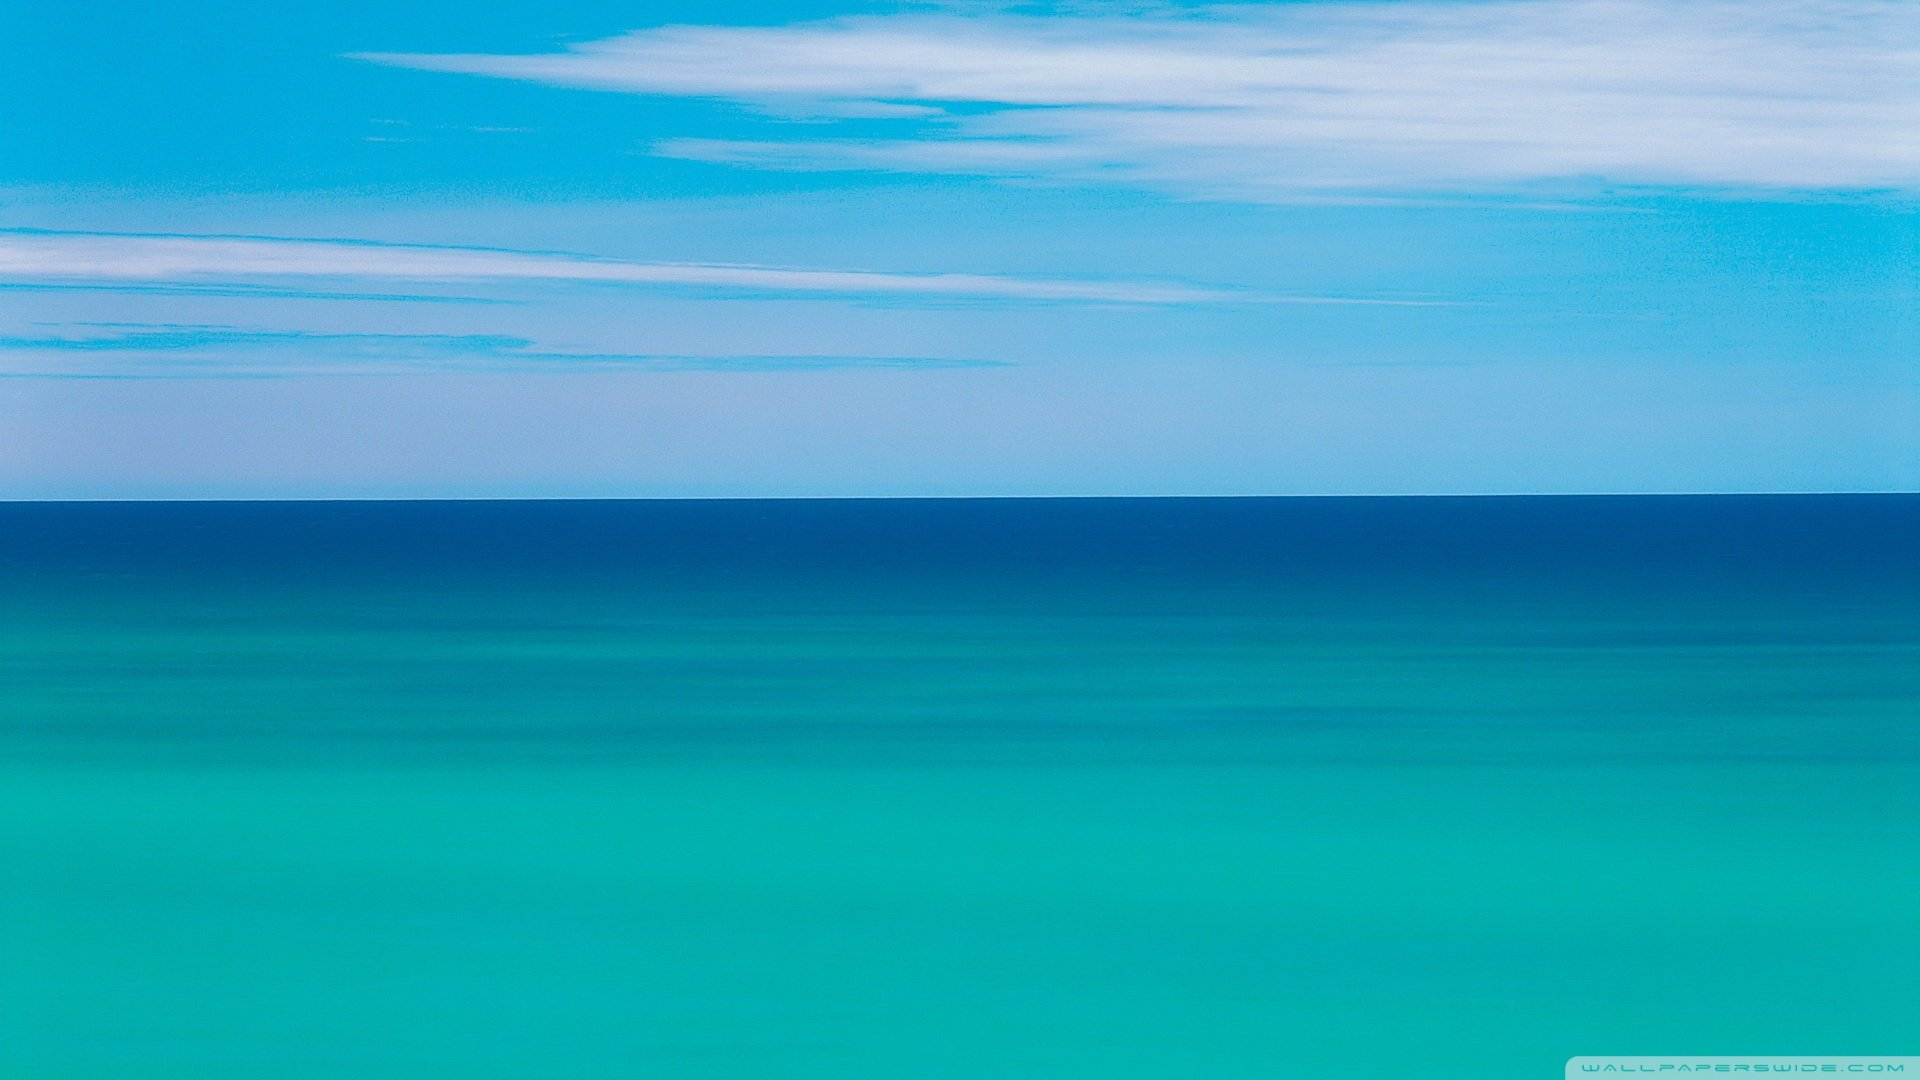 The Ocean Wallpaper 1920x1080 The Ocean 1920x1080